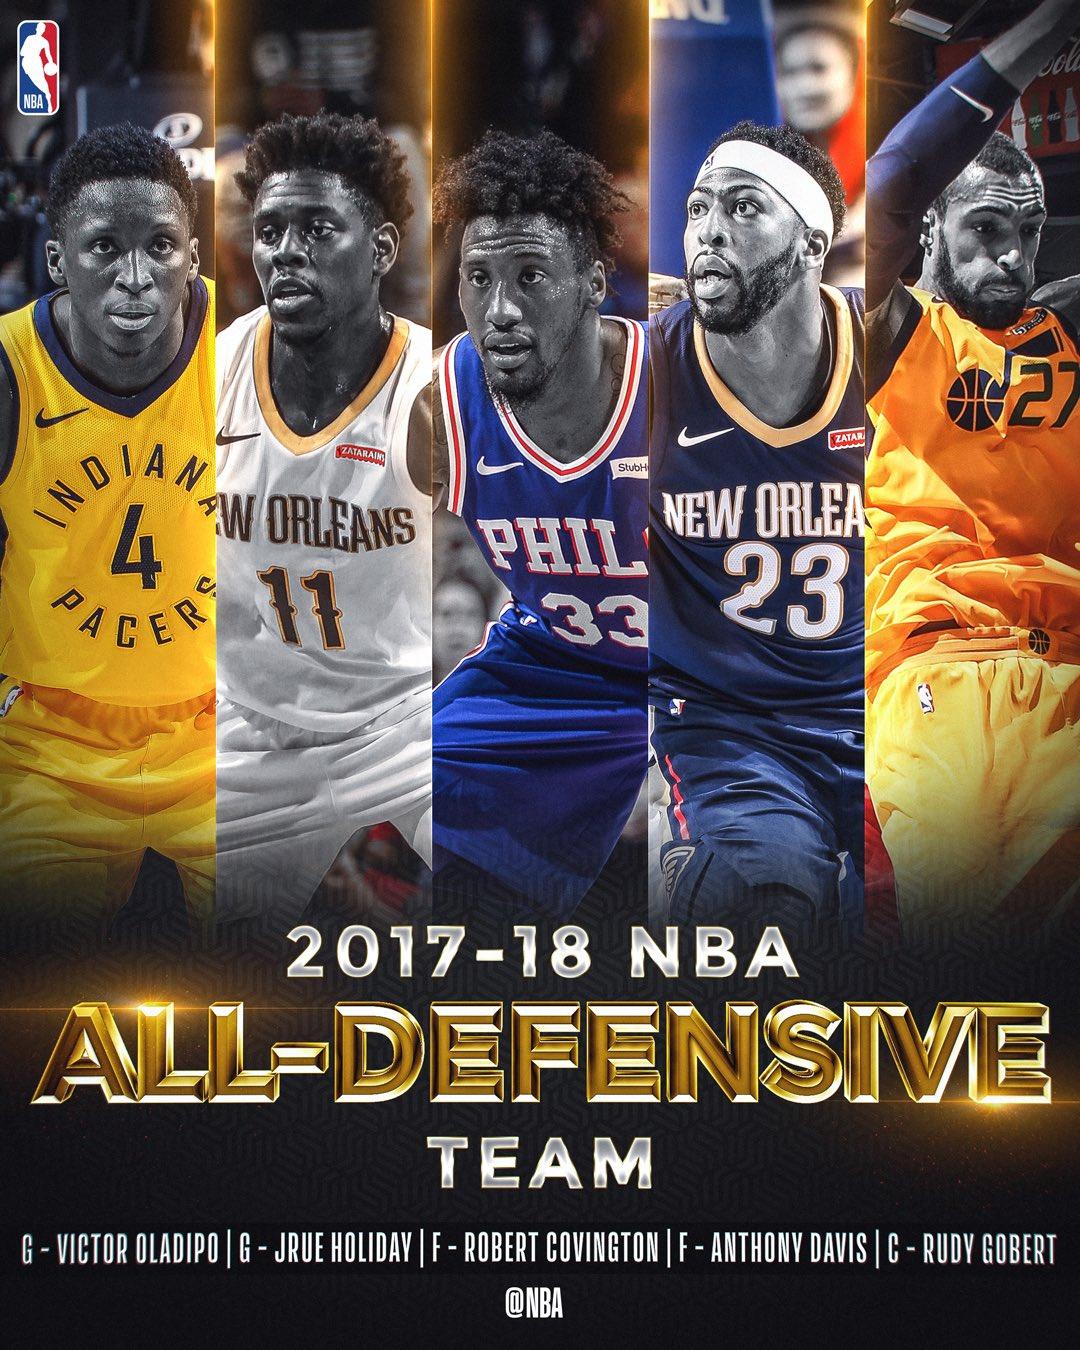 2017-18 NBA All-Defensive Team